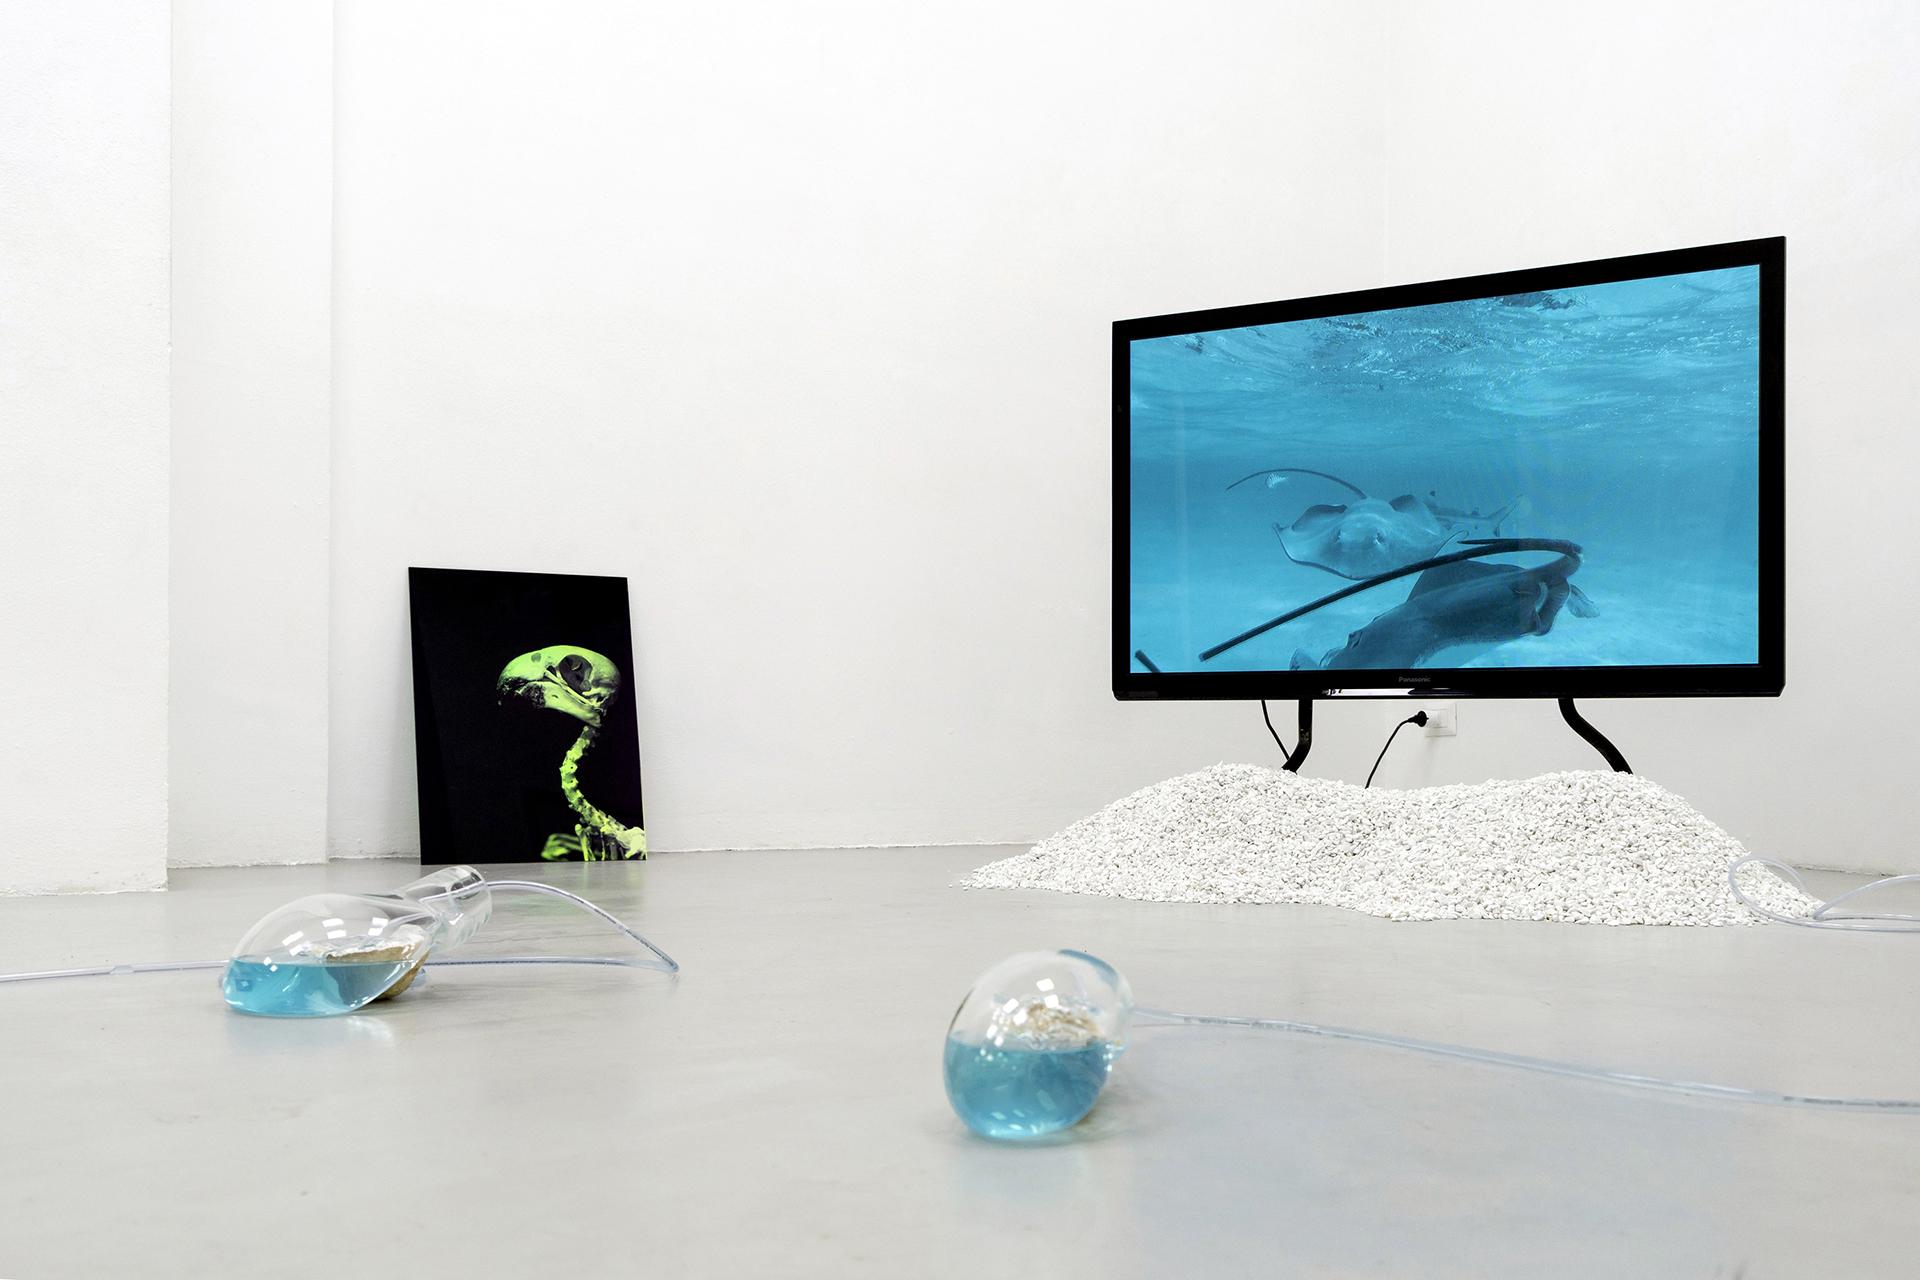 14-Paulo-Arraiano,-Sensorial-Divinities.-2019.-Exhibition-view.-Dimora-Artica-(ph-Cesare-Lopopolo).jpg